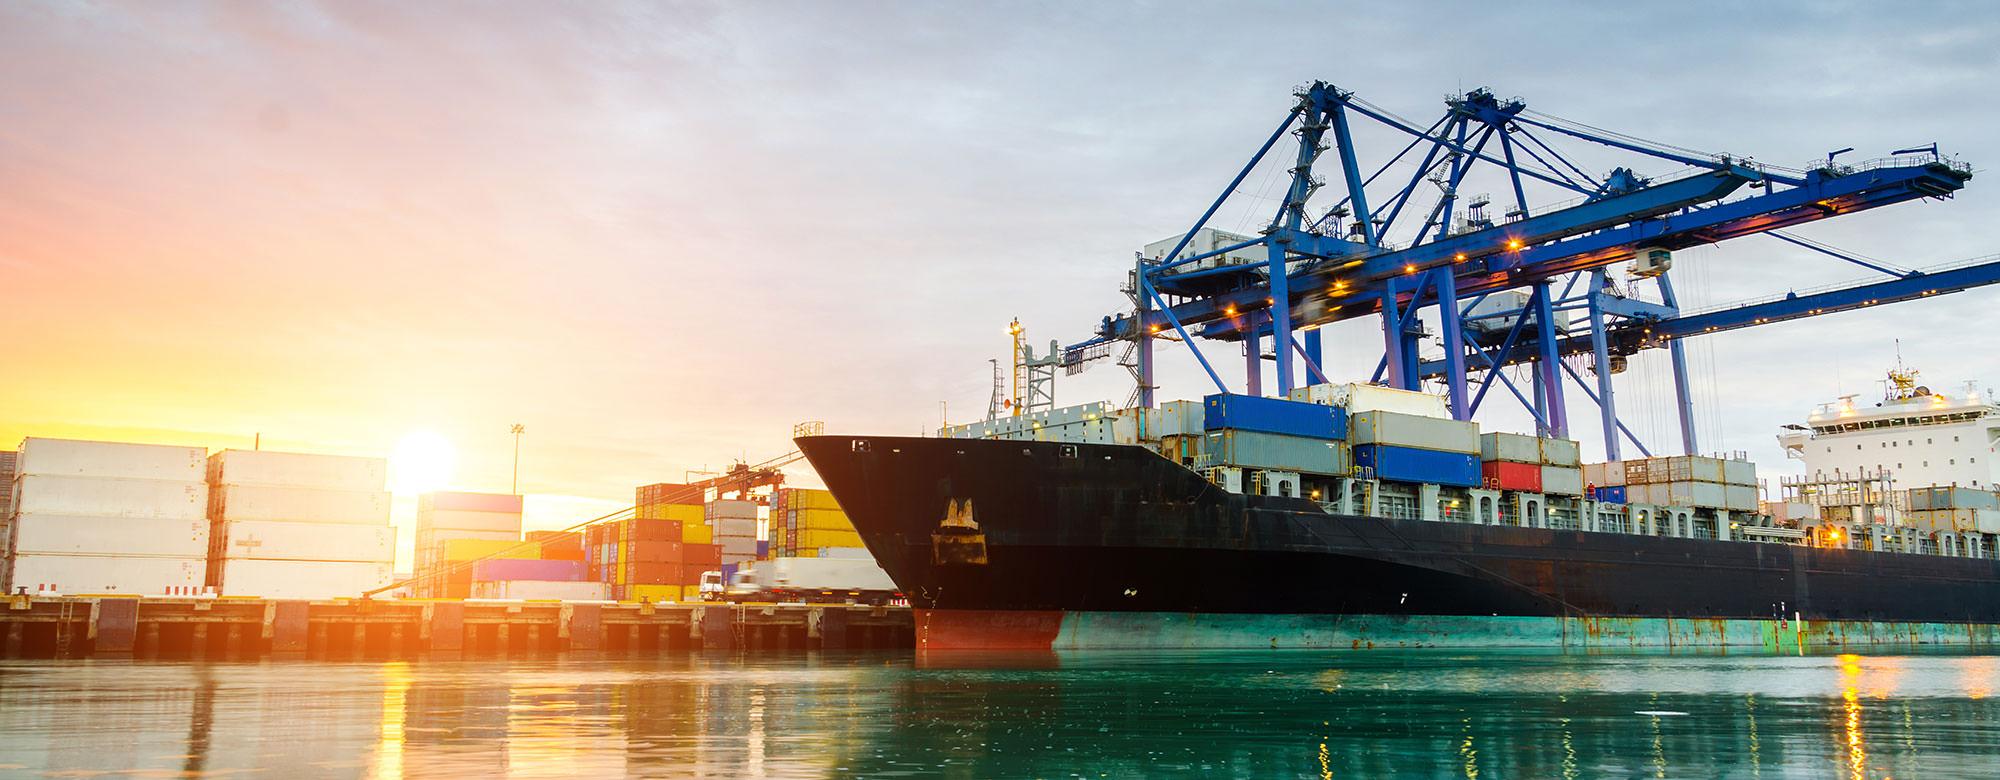 ports-marine-banner